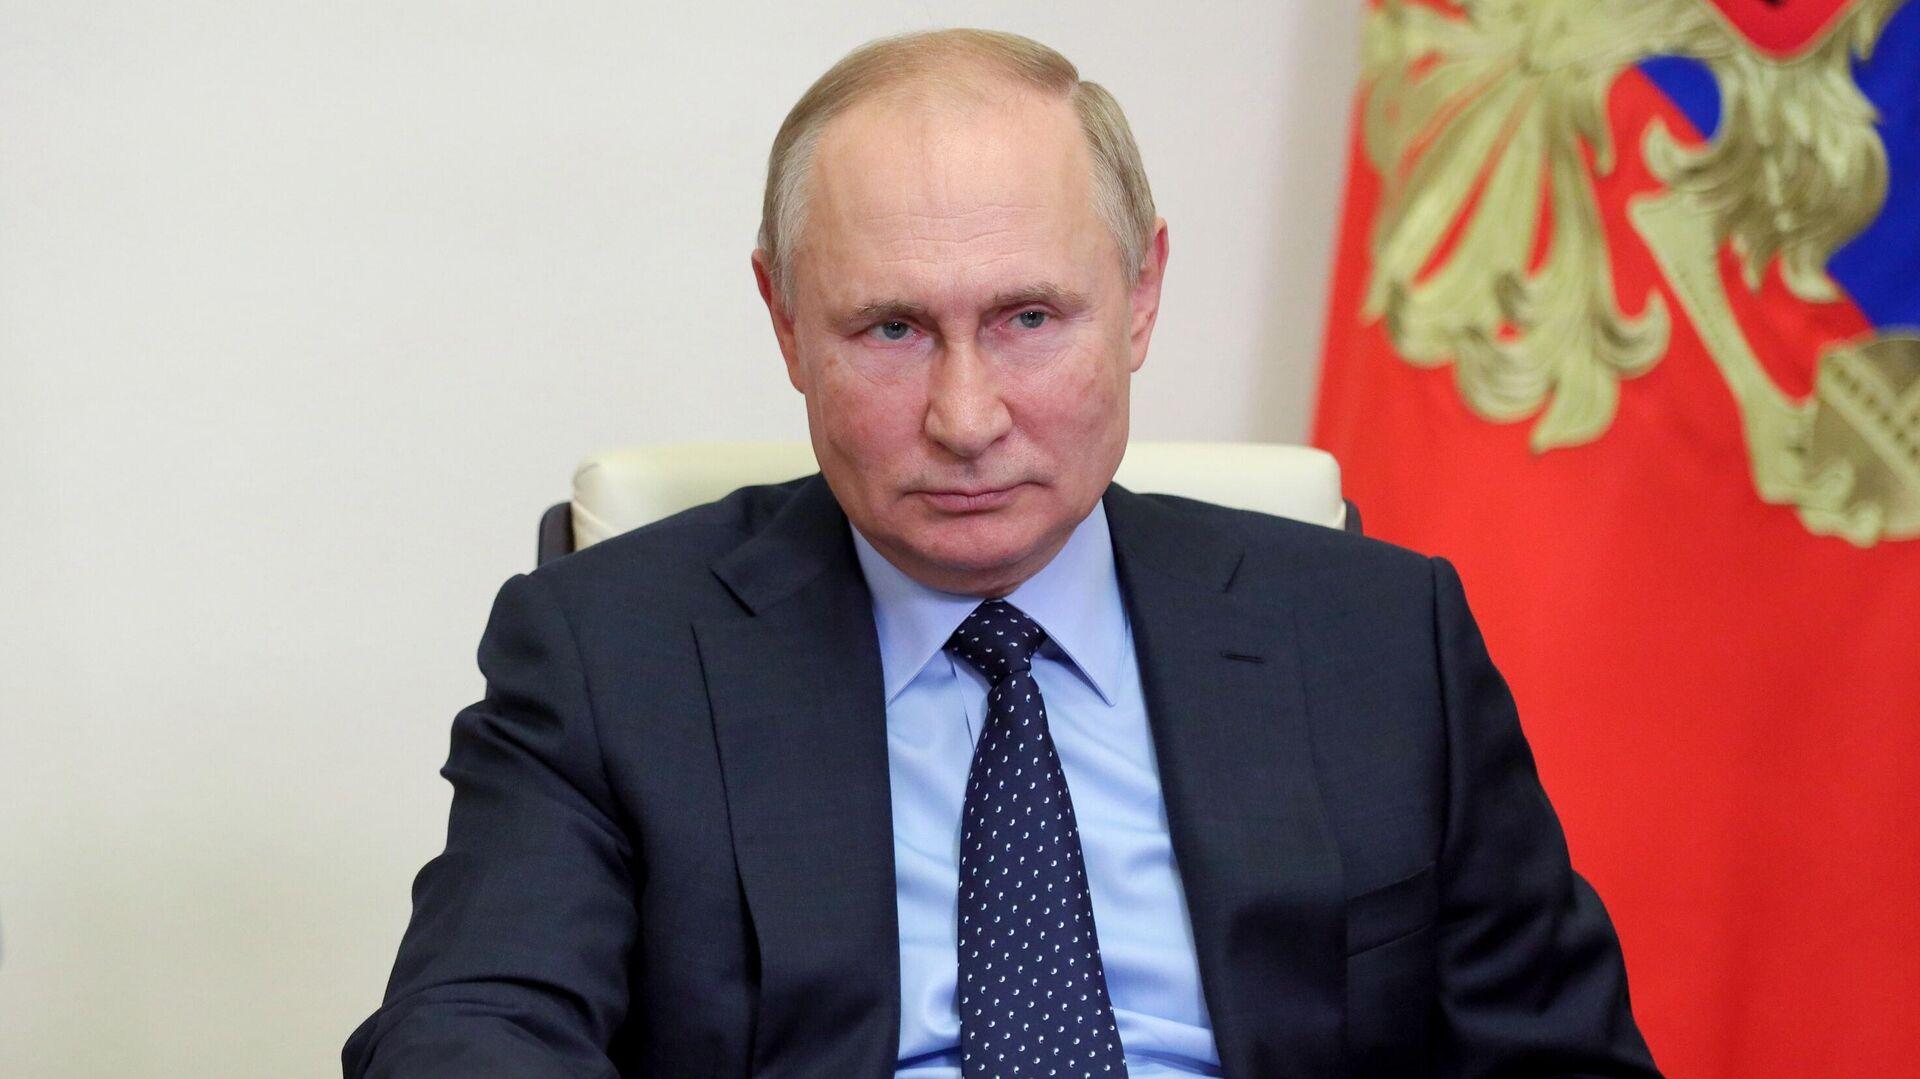 Президент РФ Владимир Путин - Sputnik Беларусь, 1920, 05.10.2021